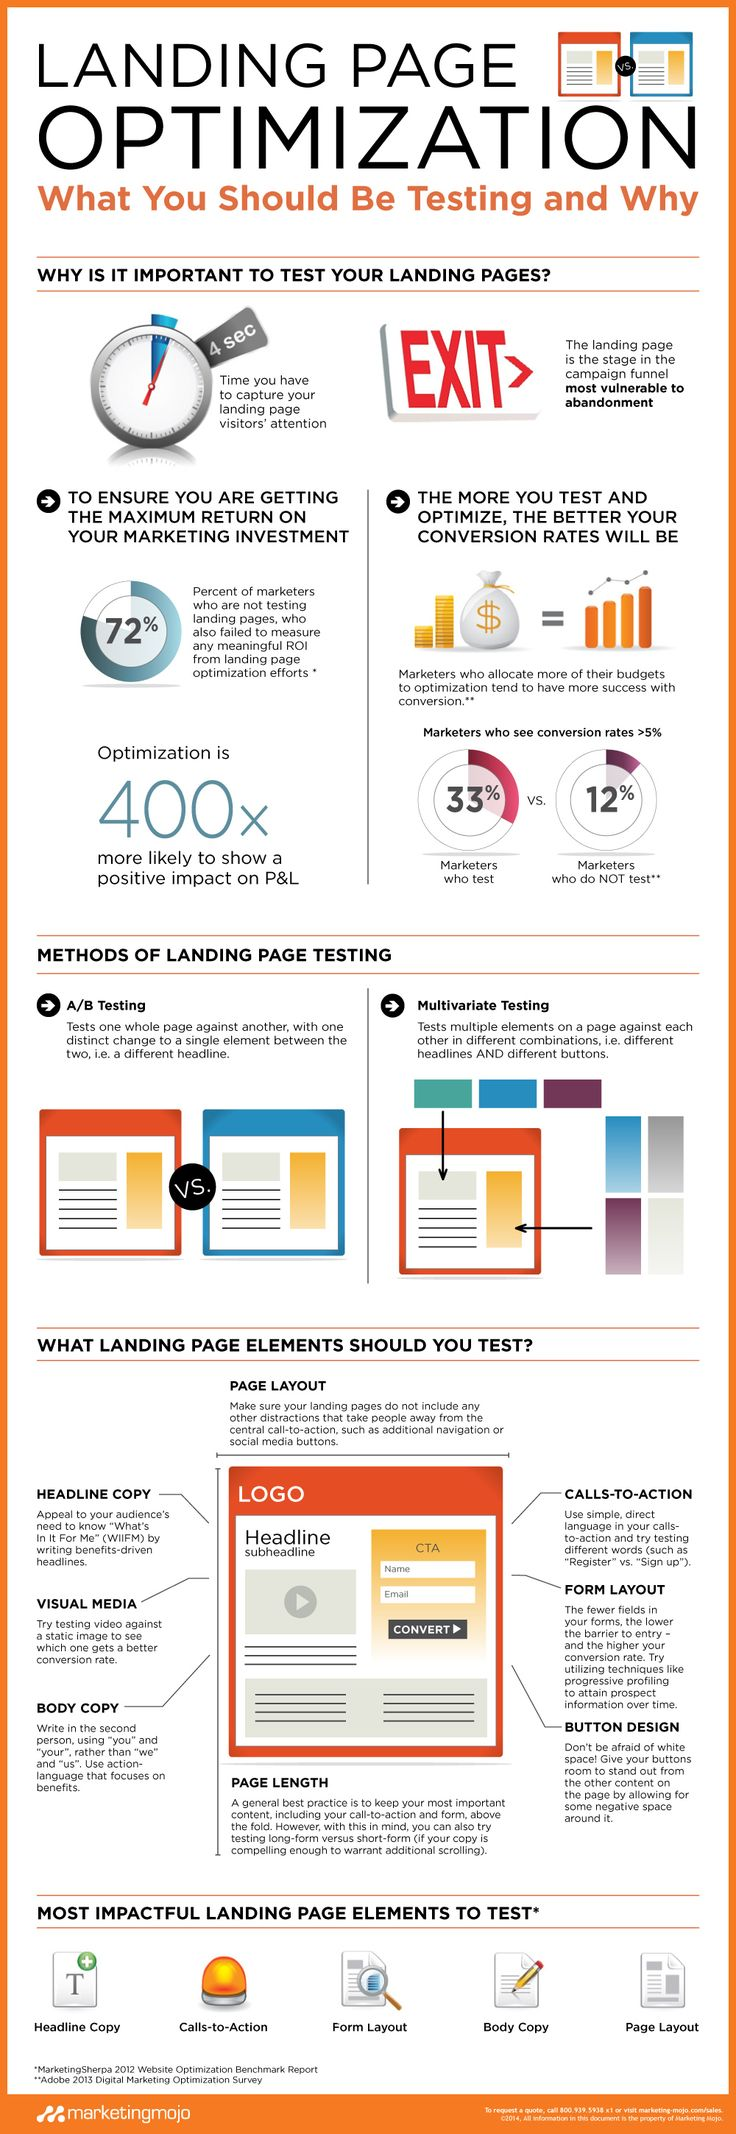 Marketing-Mojo_Landing_Page_Optimization_Infographic.jpg (1000×2900)